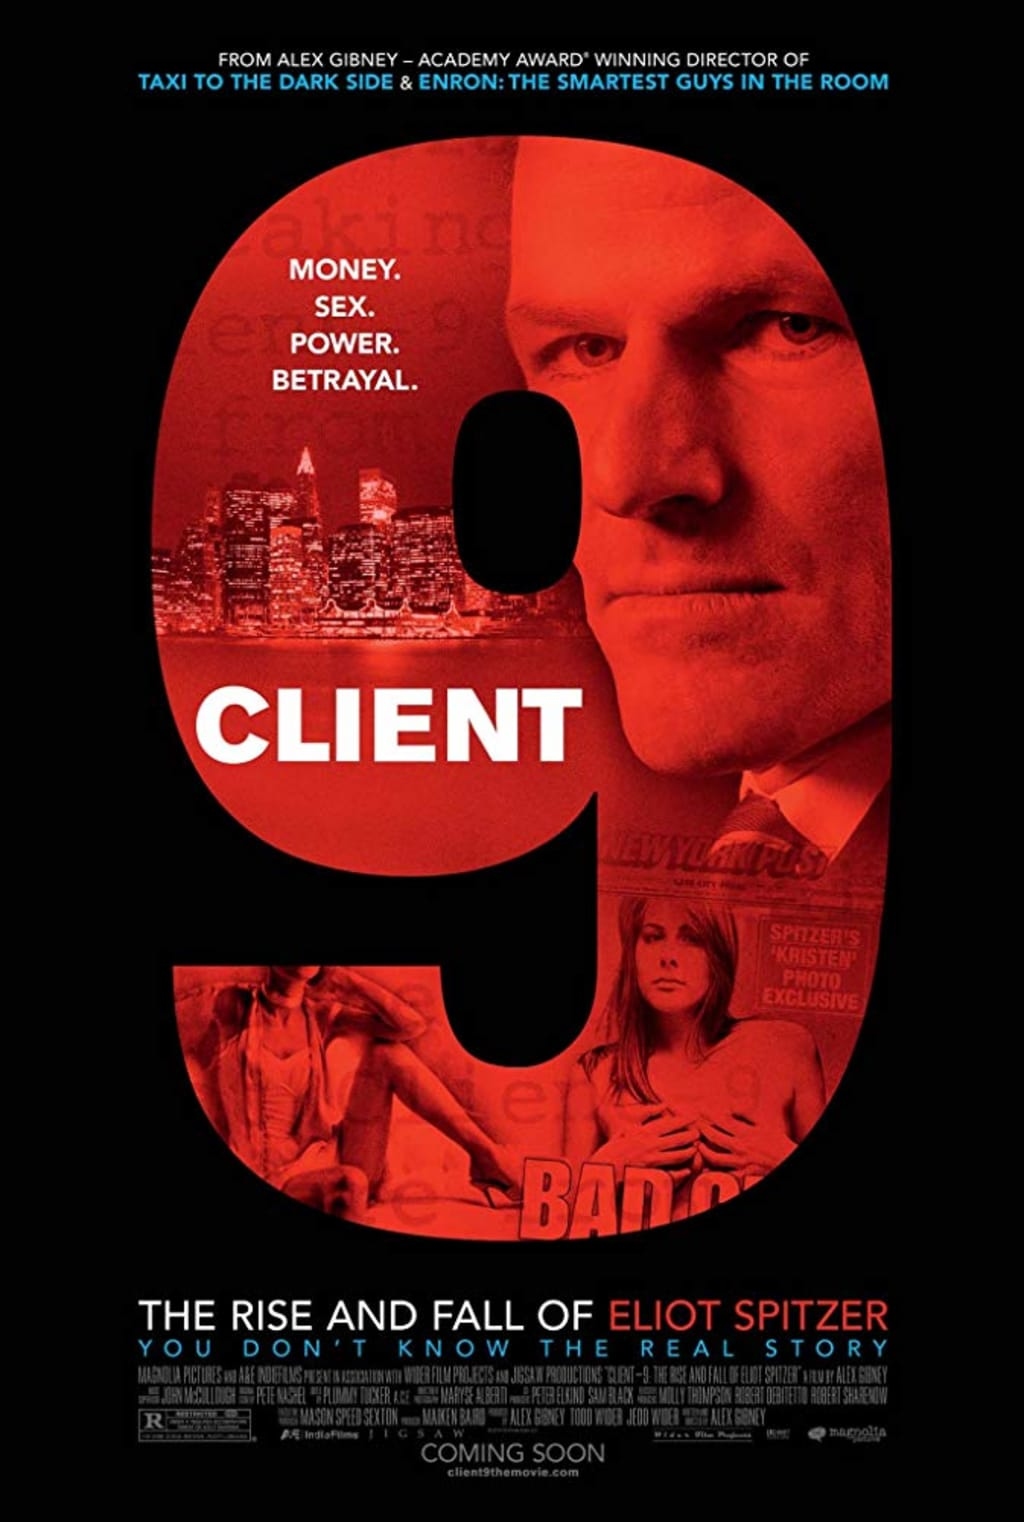 Oscar Winning Filmmaker Unravels Eliot Spitzer Scandal in New Documentary